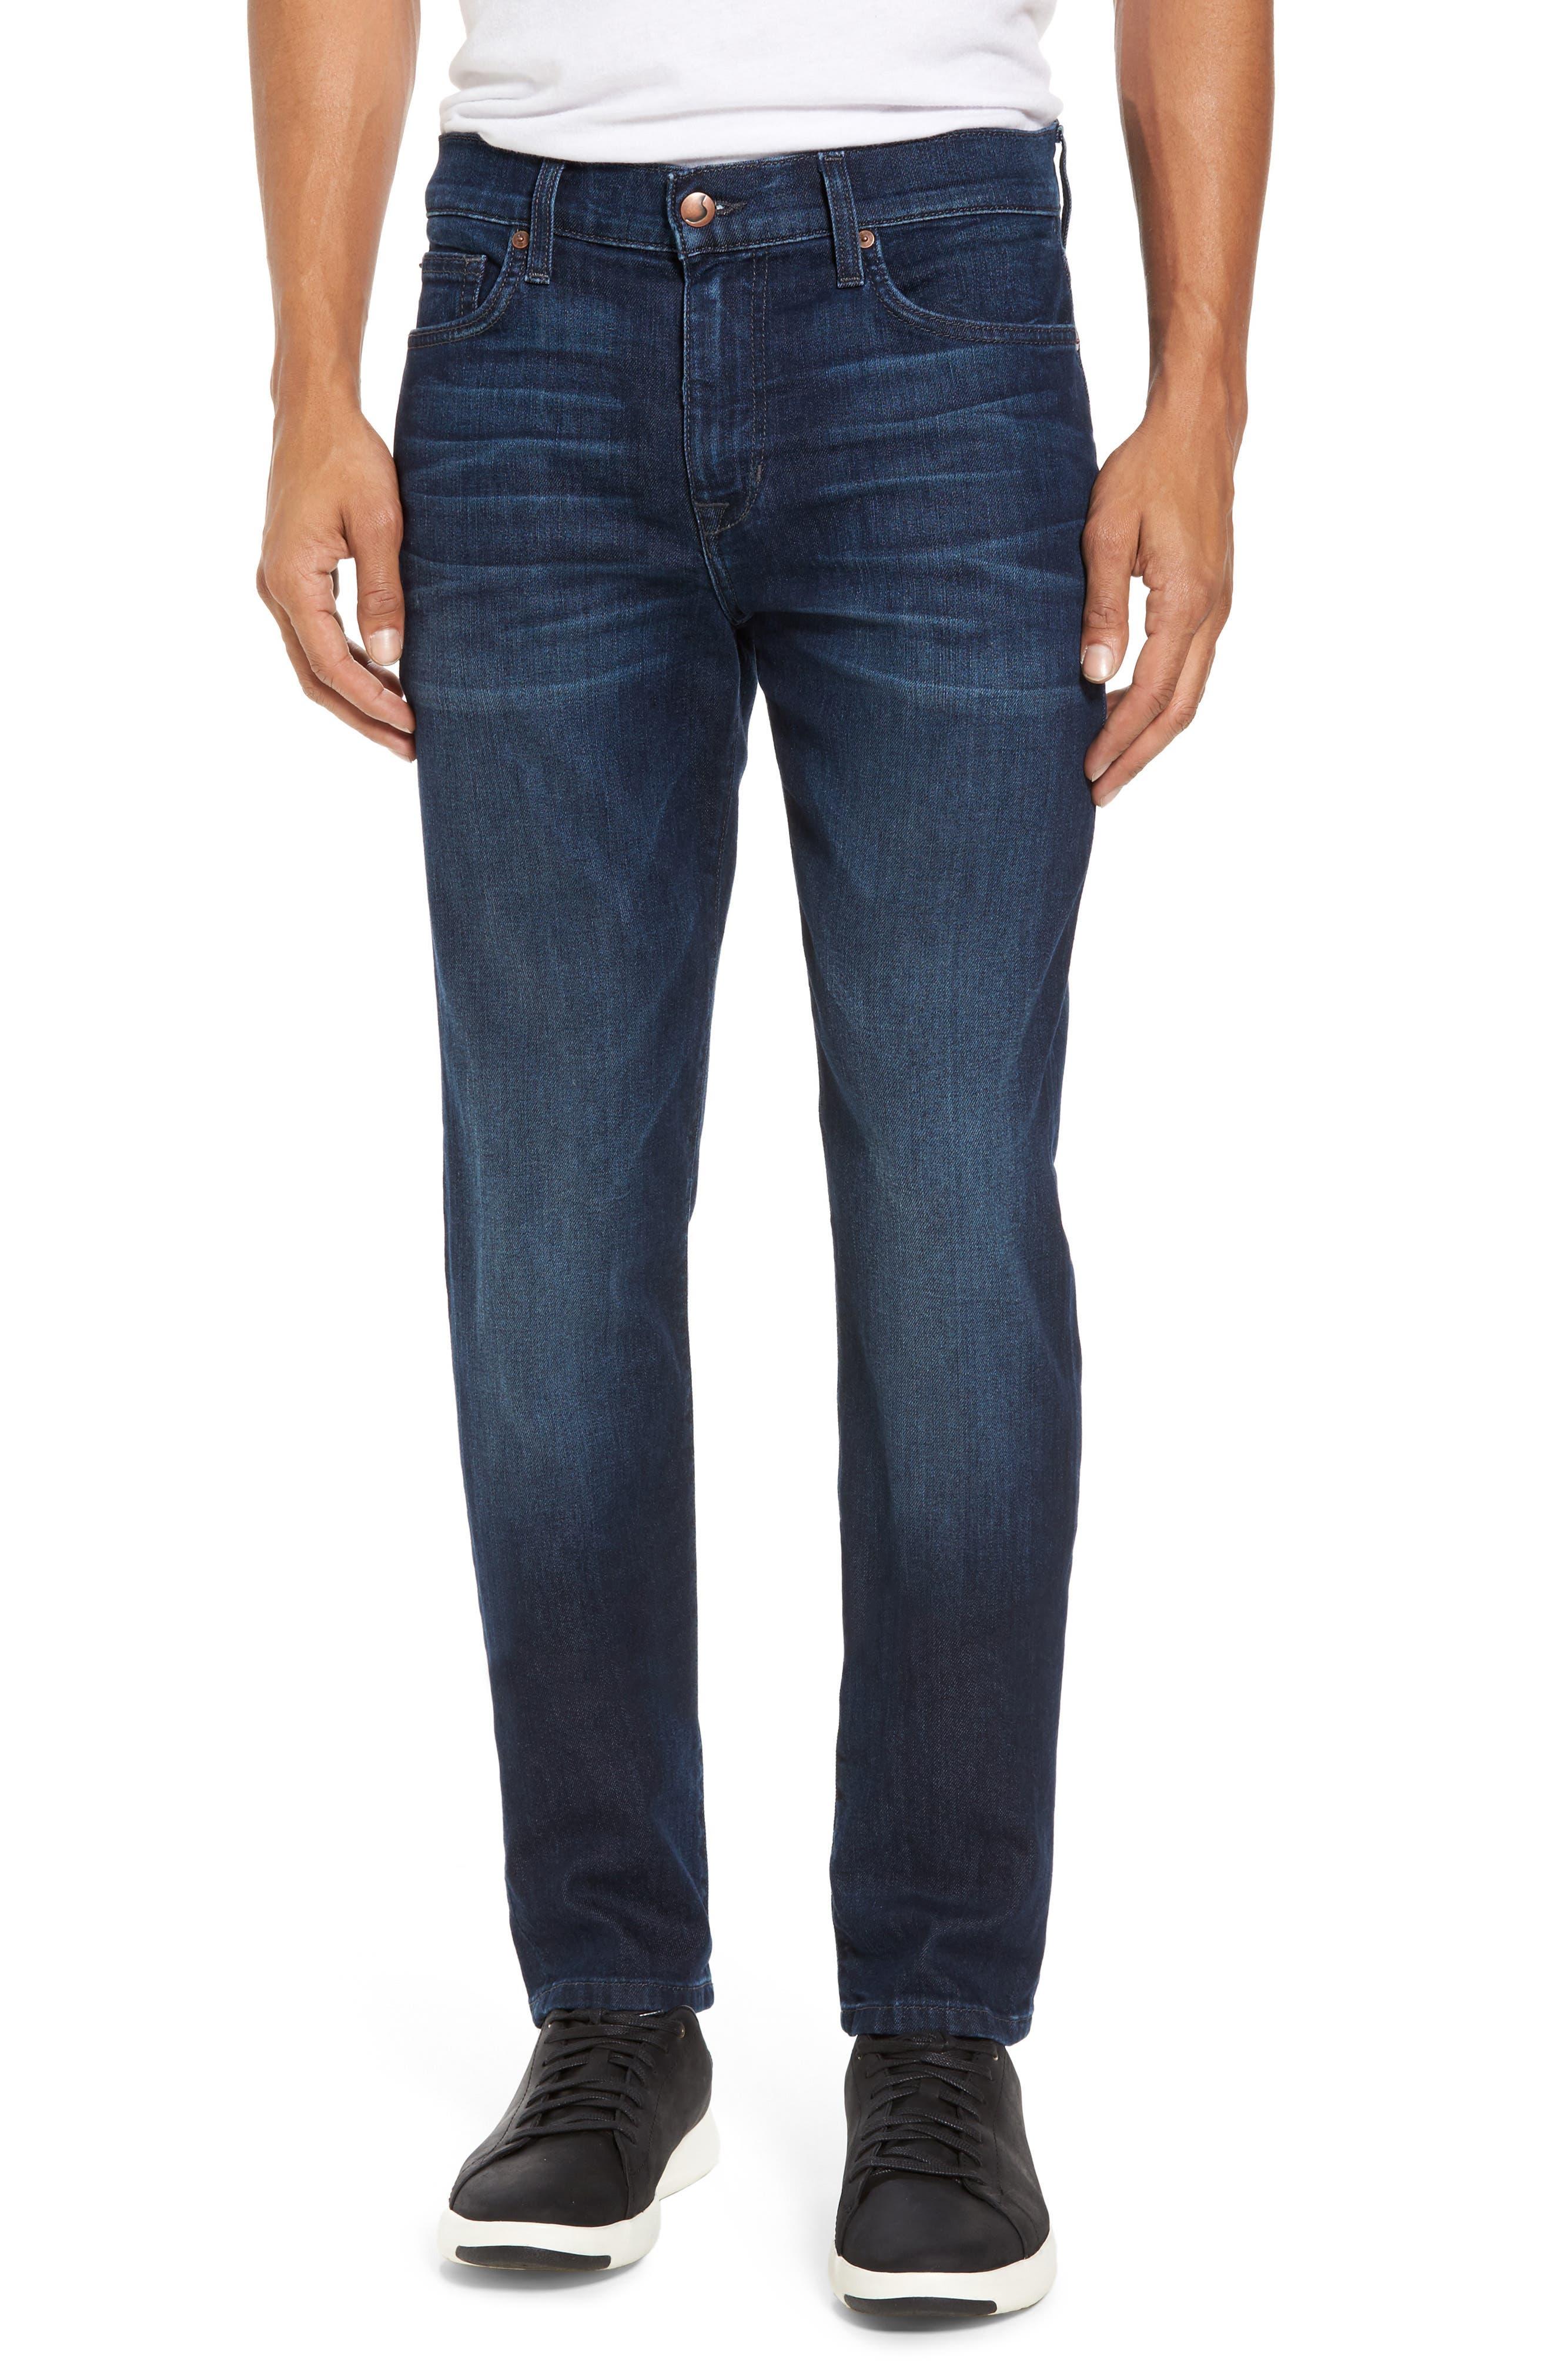 Joe's Slim Fit Jeans (Izaak)